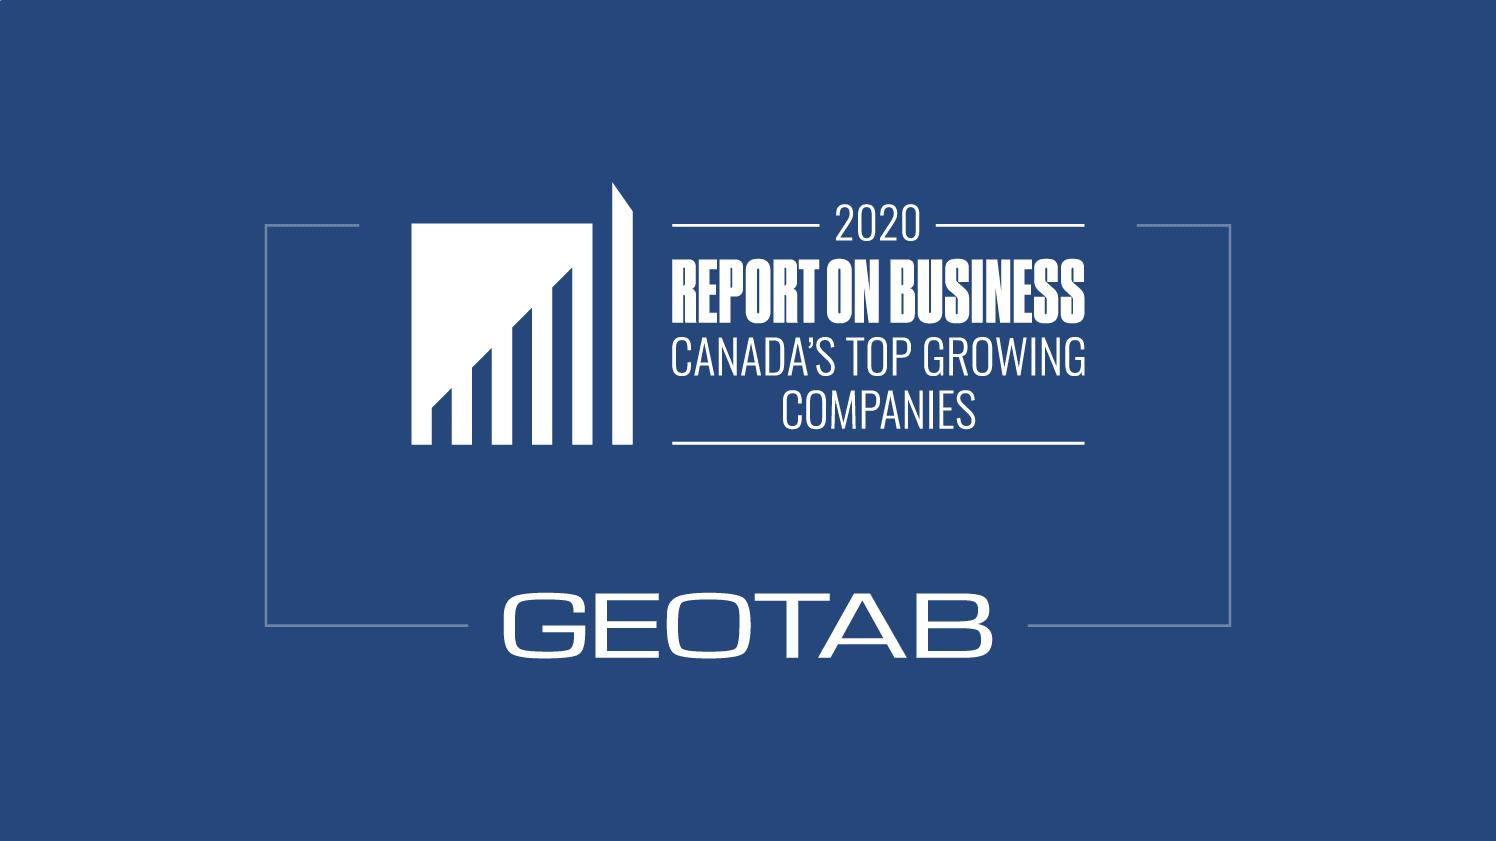 Top Growing Company and Geotab Logos